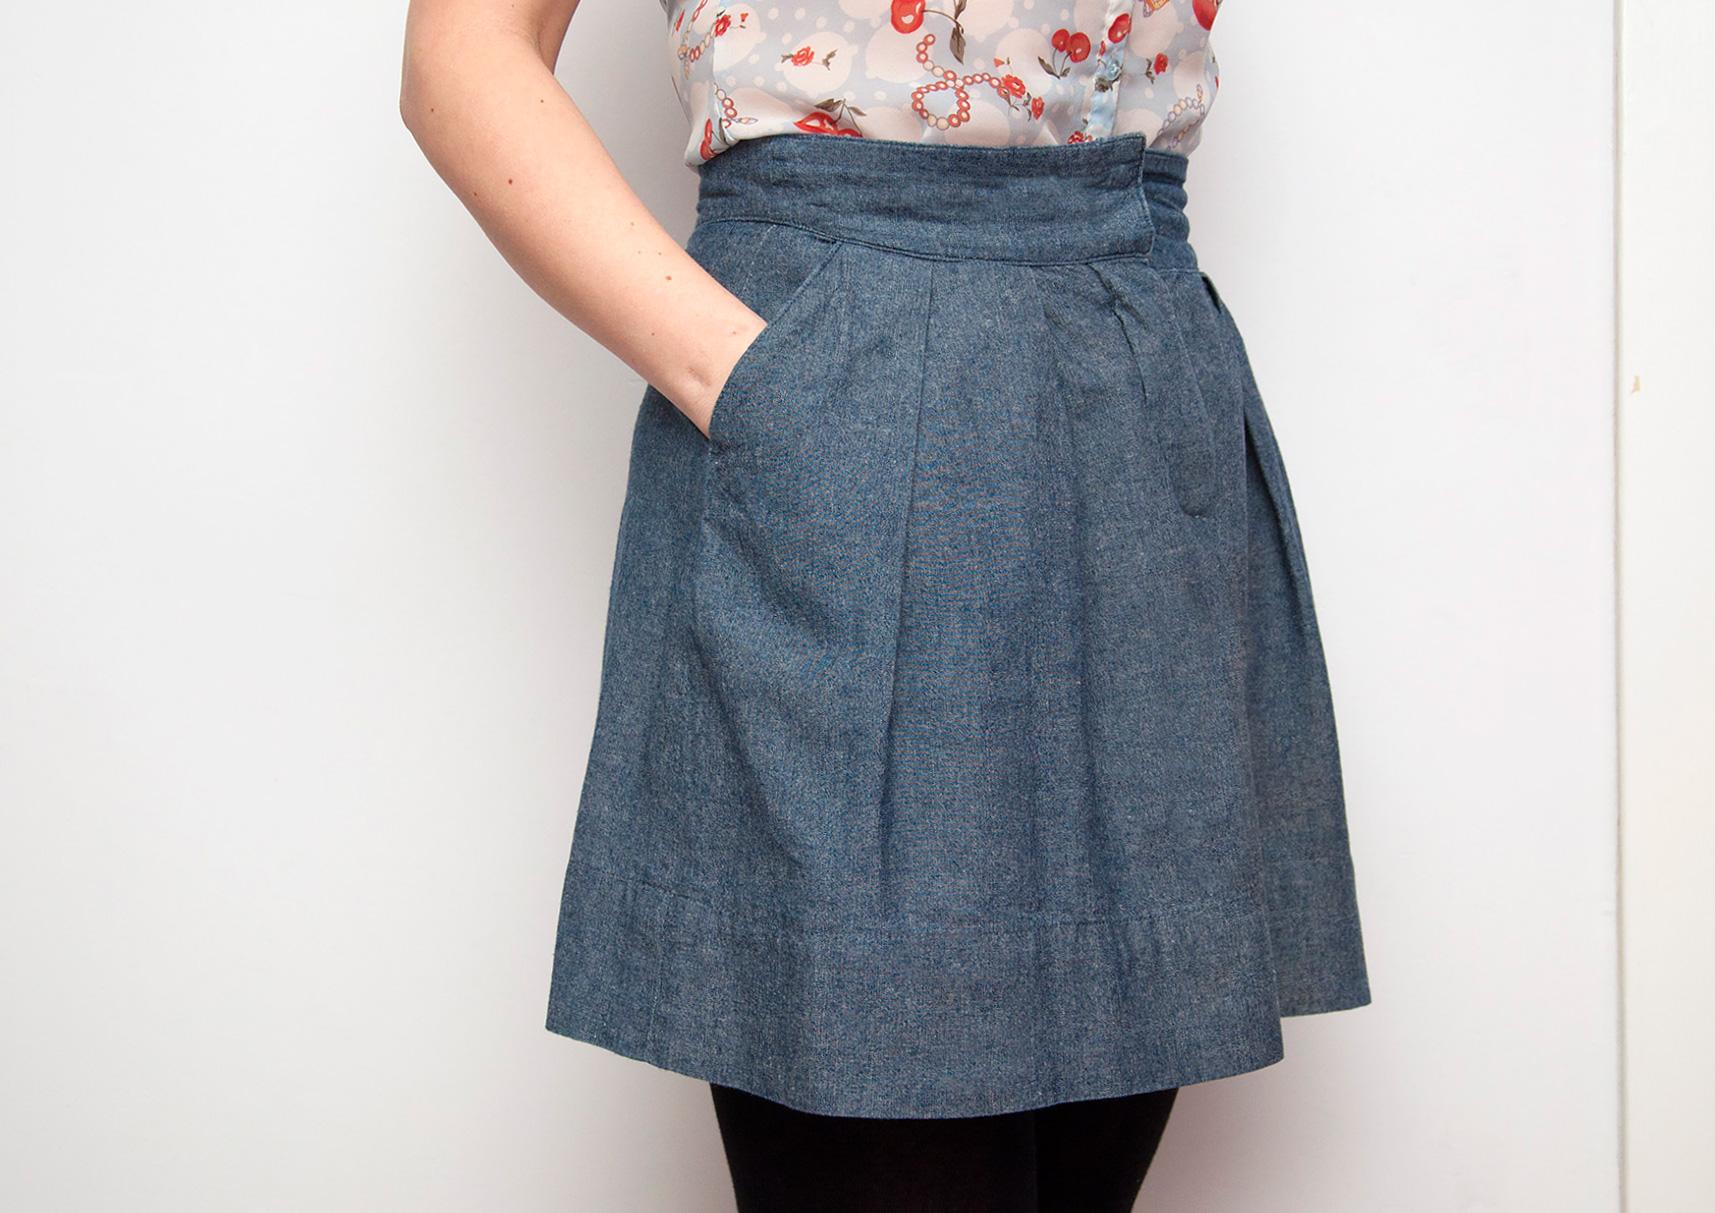 Burdastyle chambray skirt